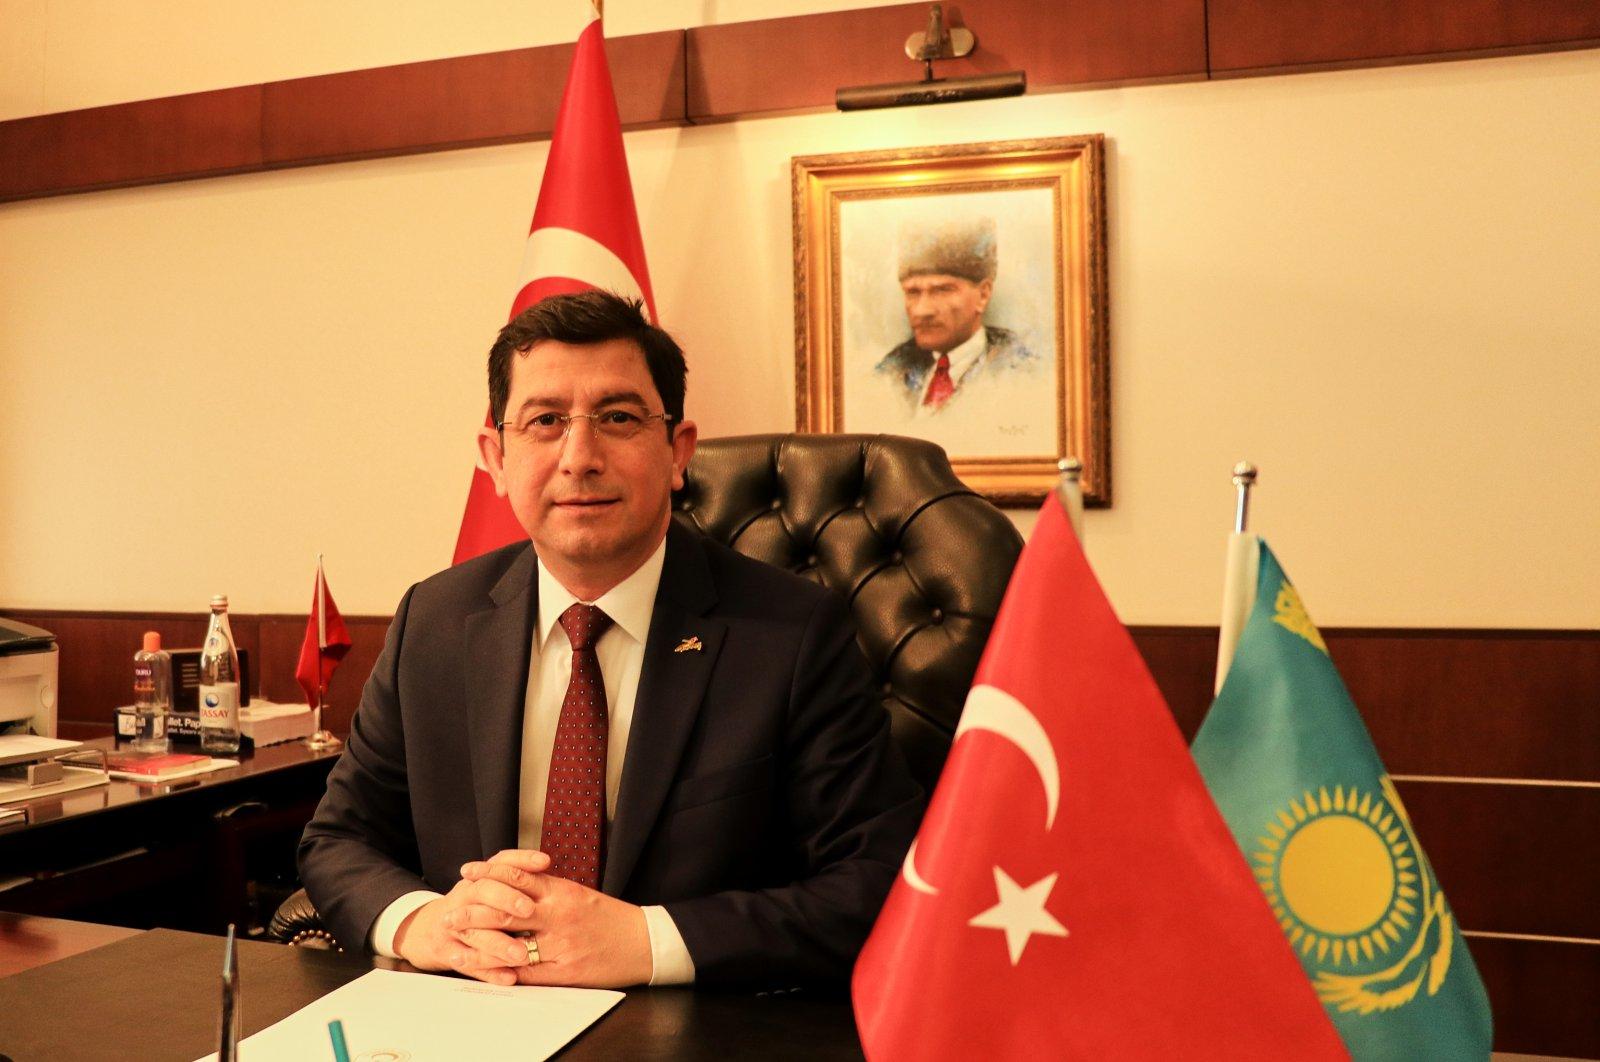 Turkish Ambassador to Nur Sultan, Ufuk Ekici during an interview with the Anadolu Agency (AA), in Nur Sultan, Kazakhstan, March 2, 2021. (AA Photo)